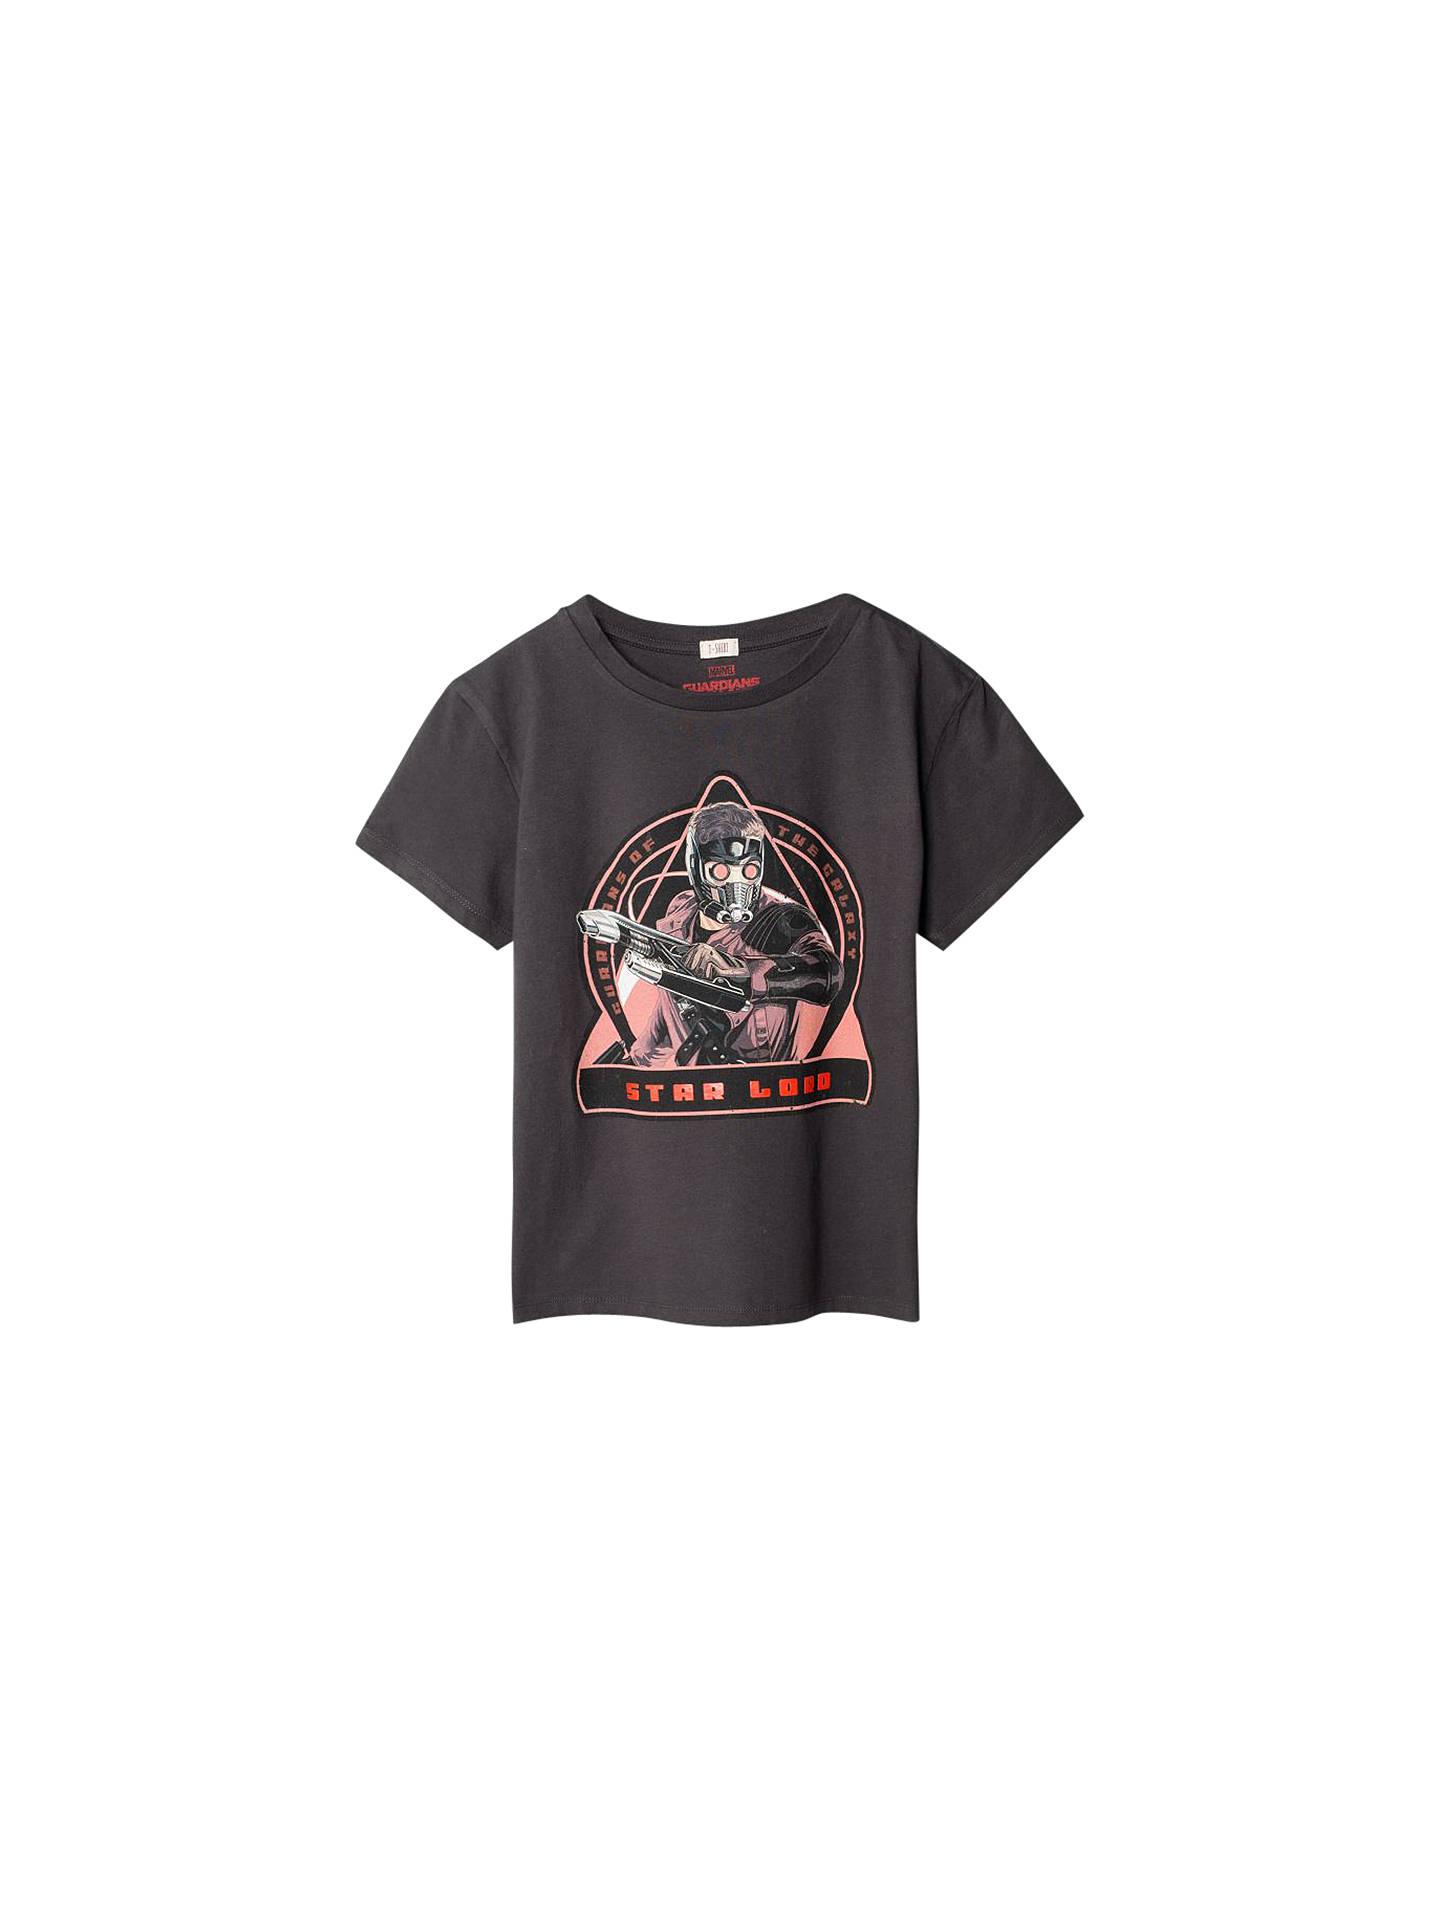 58b035cad86 Mango Kids Boys' Guardians of the Galaxy Star Lord T-Shirt, Charcoal ...